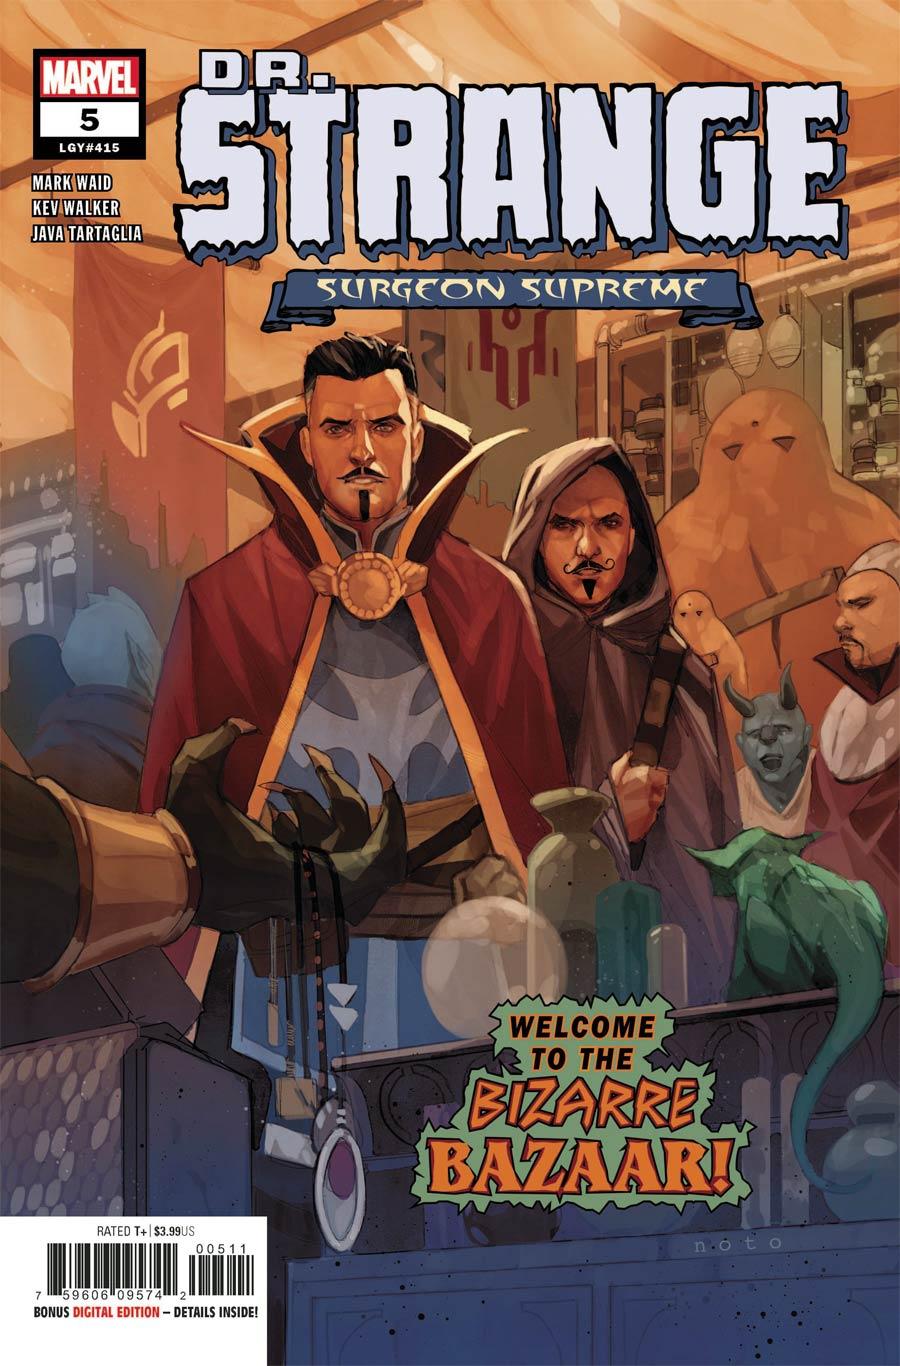 Doctor Strange Surgeon Supreme #5 Cover A Regular Phil Noto Cover